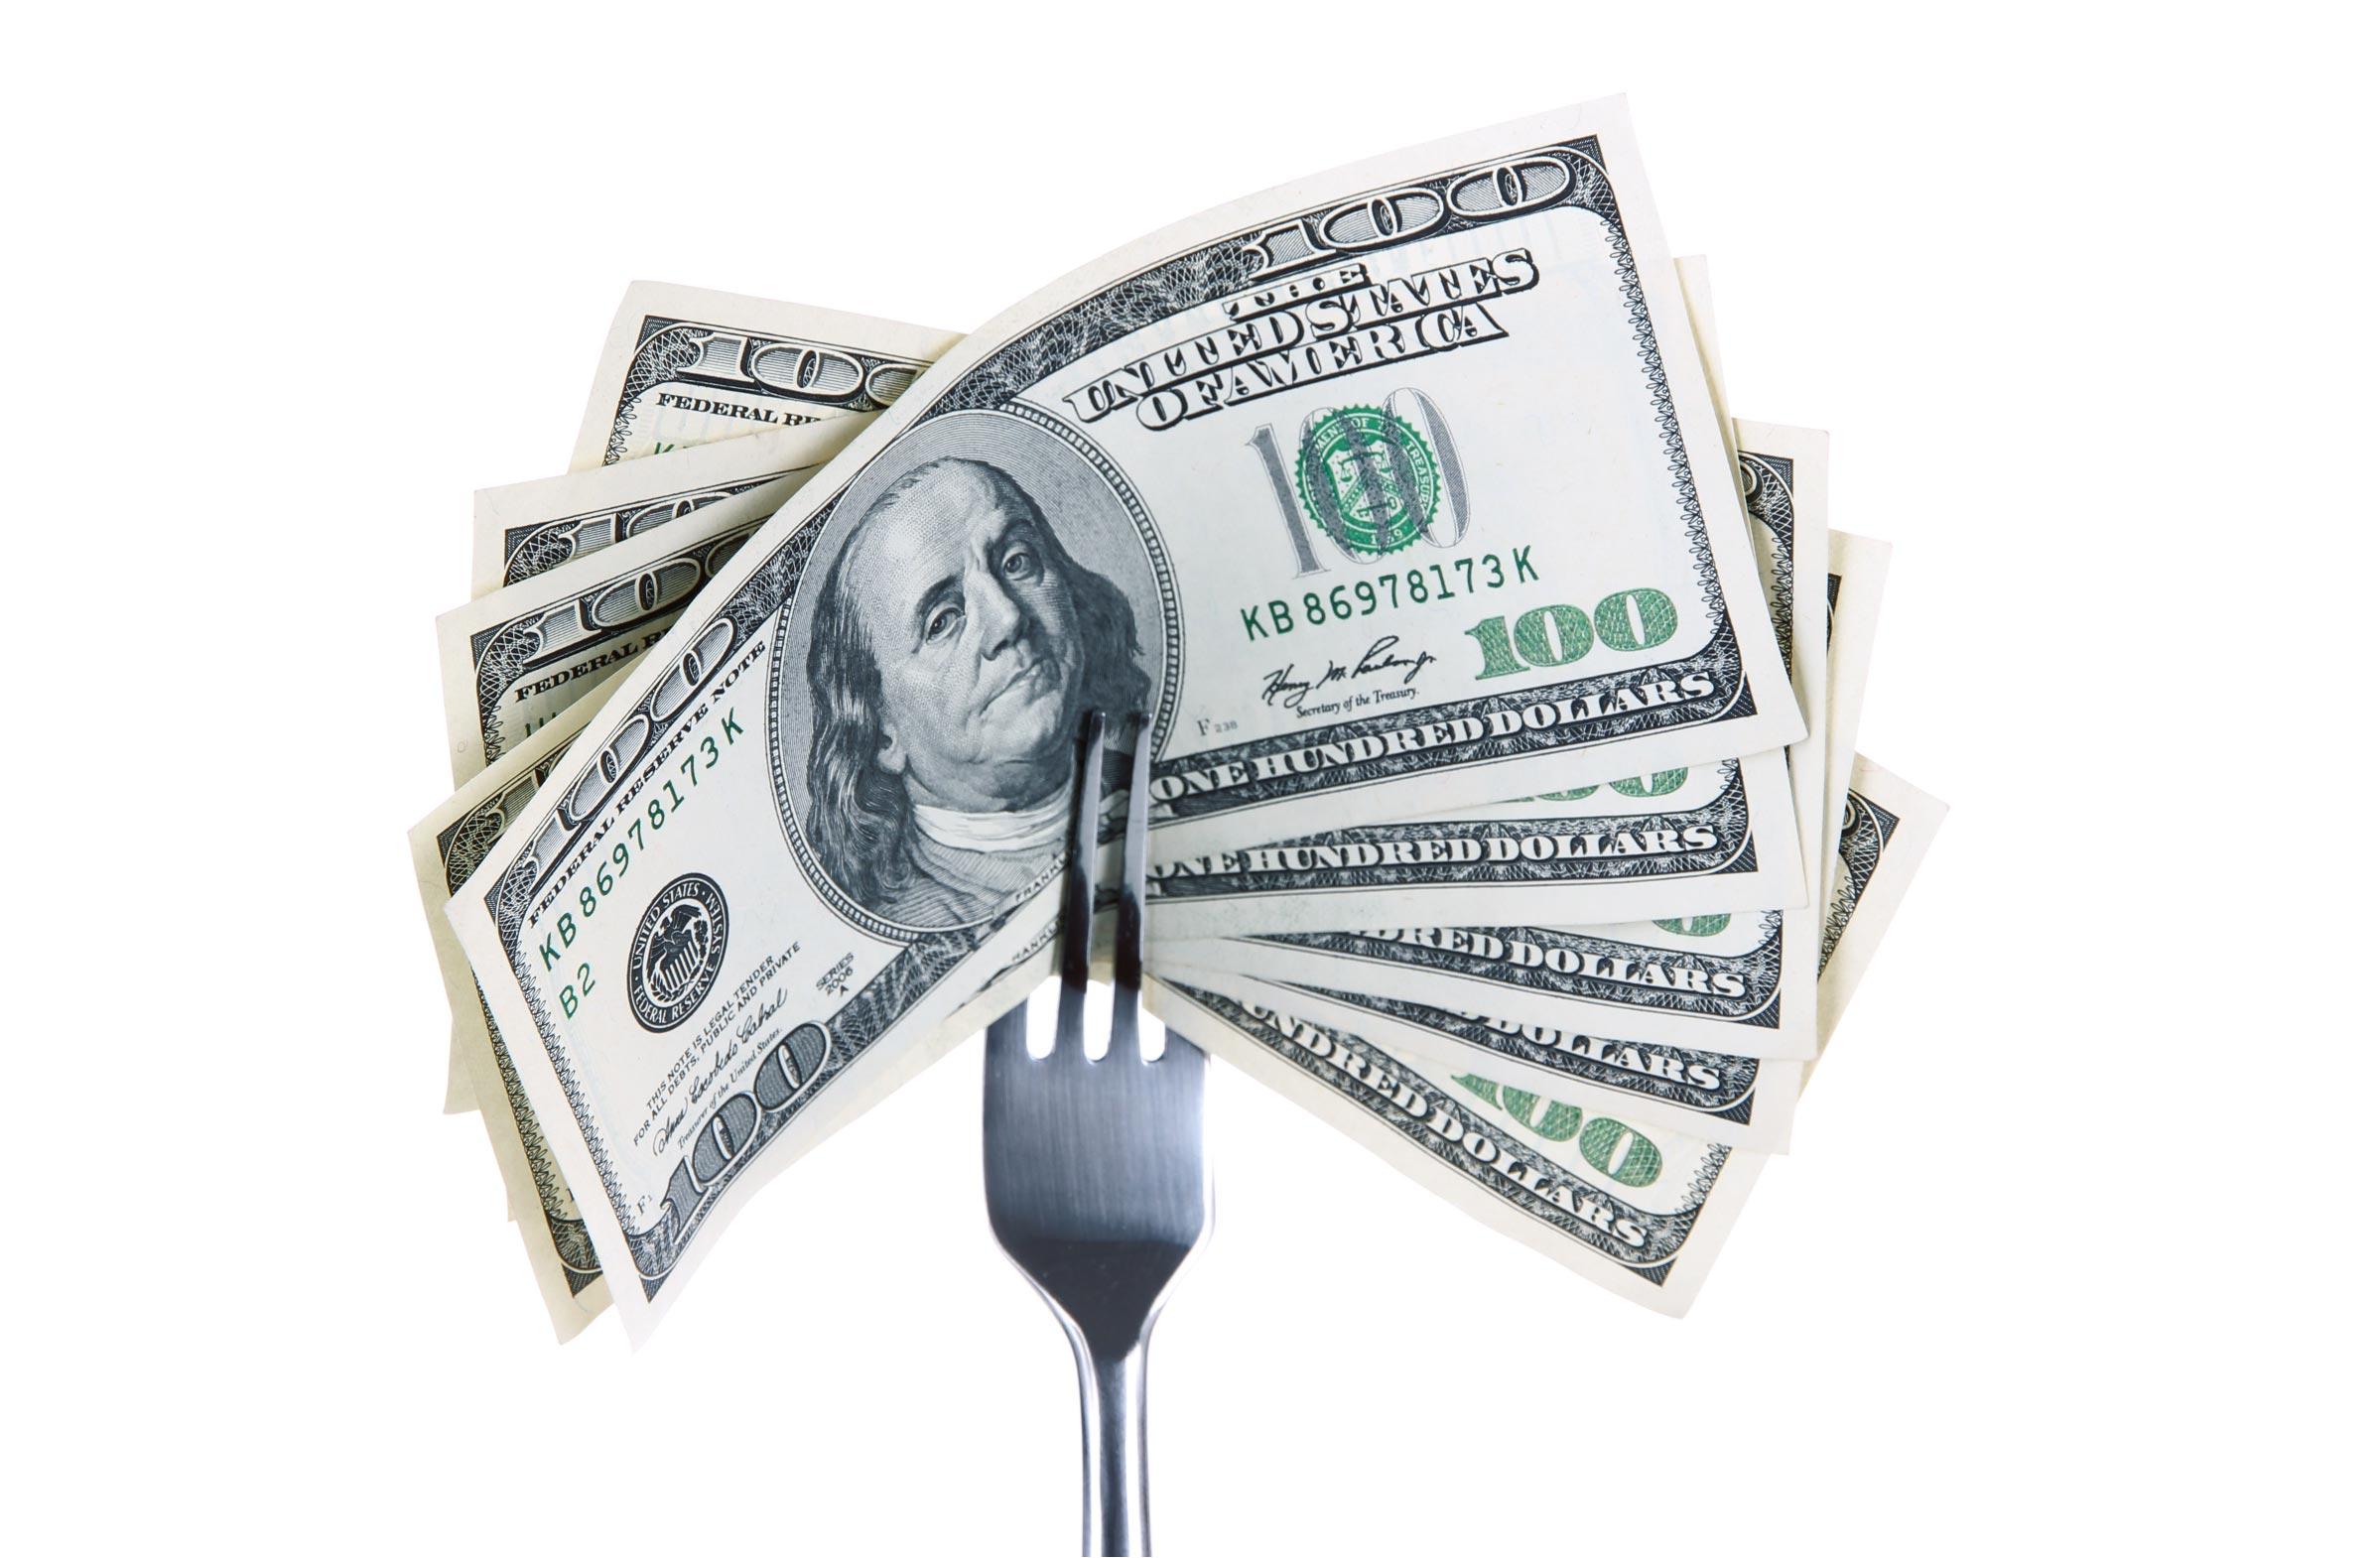 TEK-About-food money-01